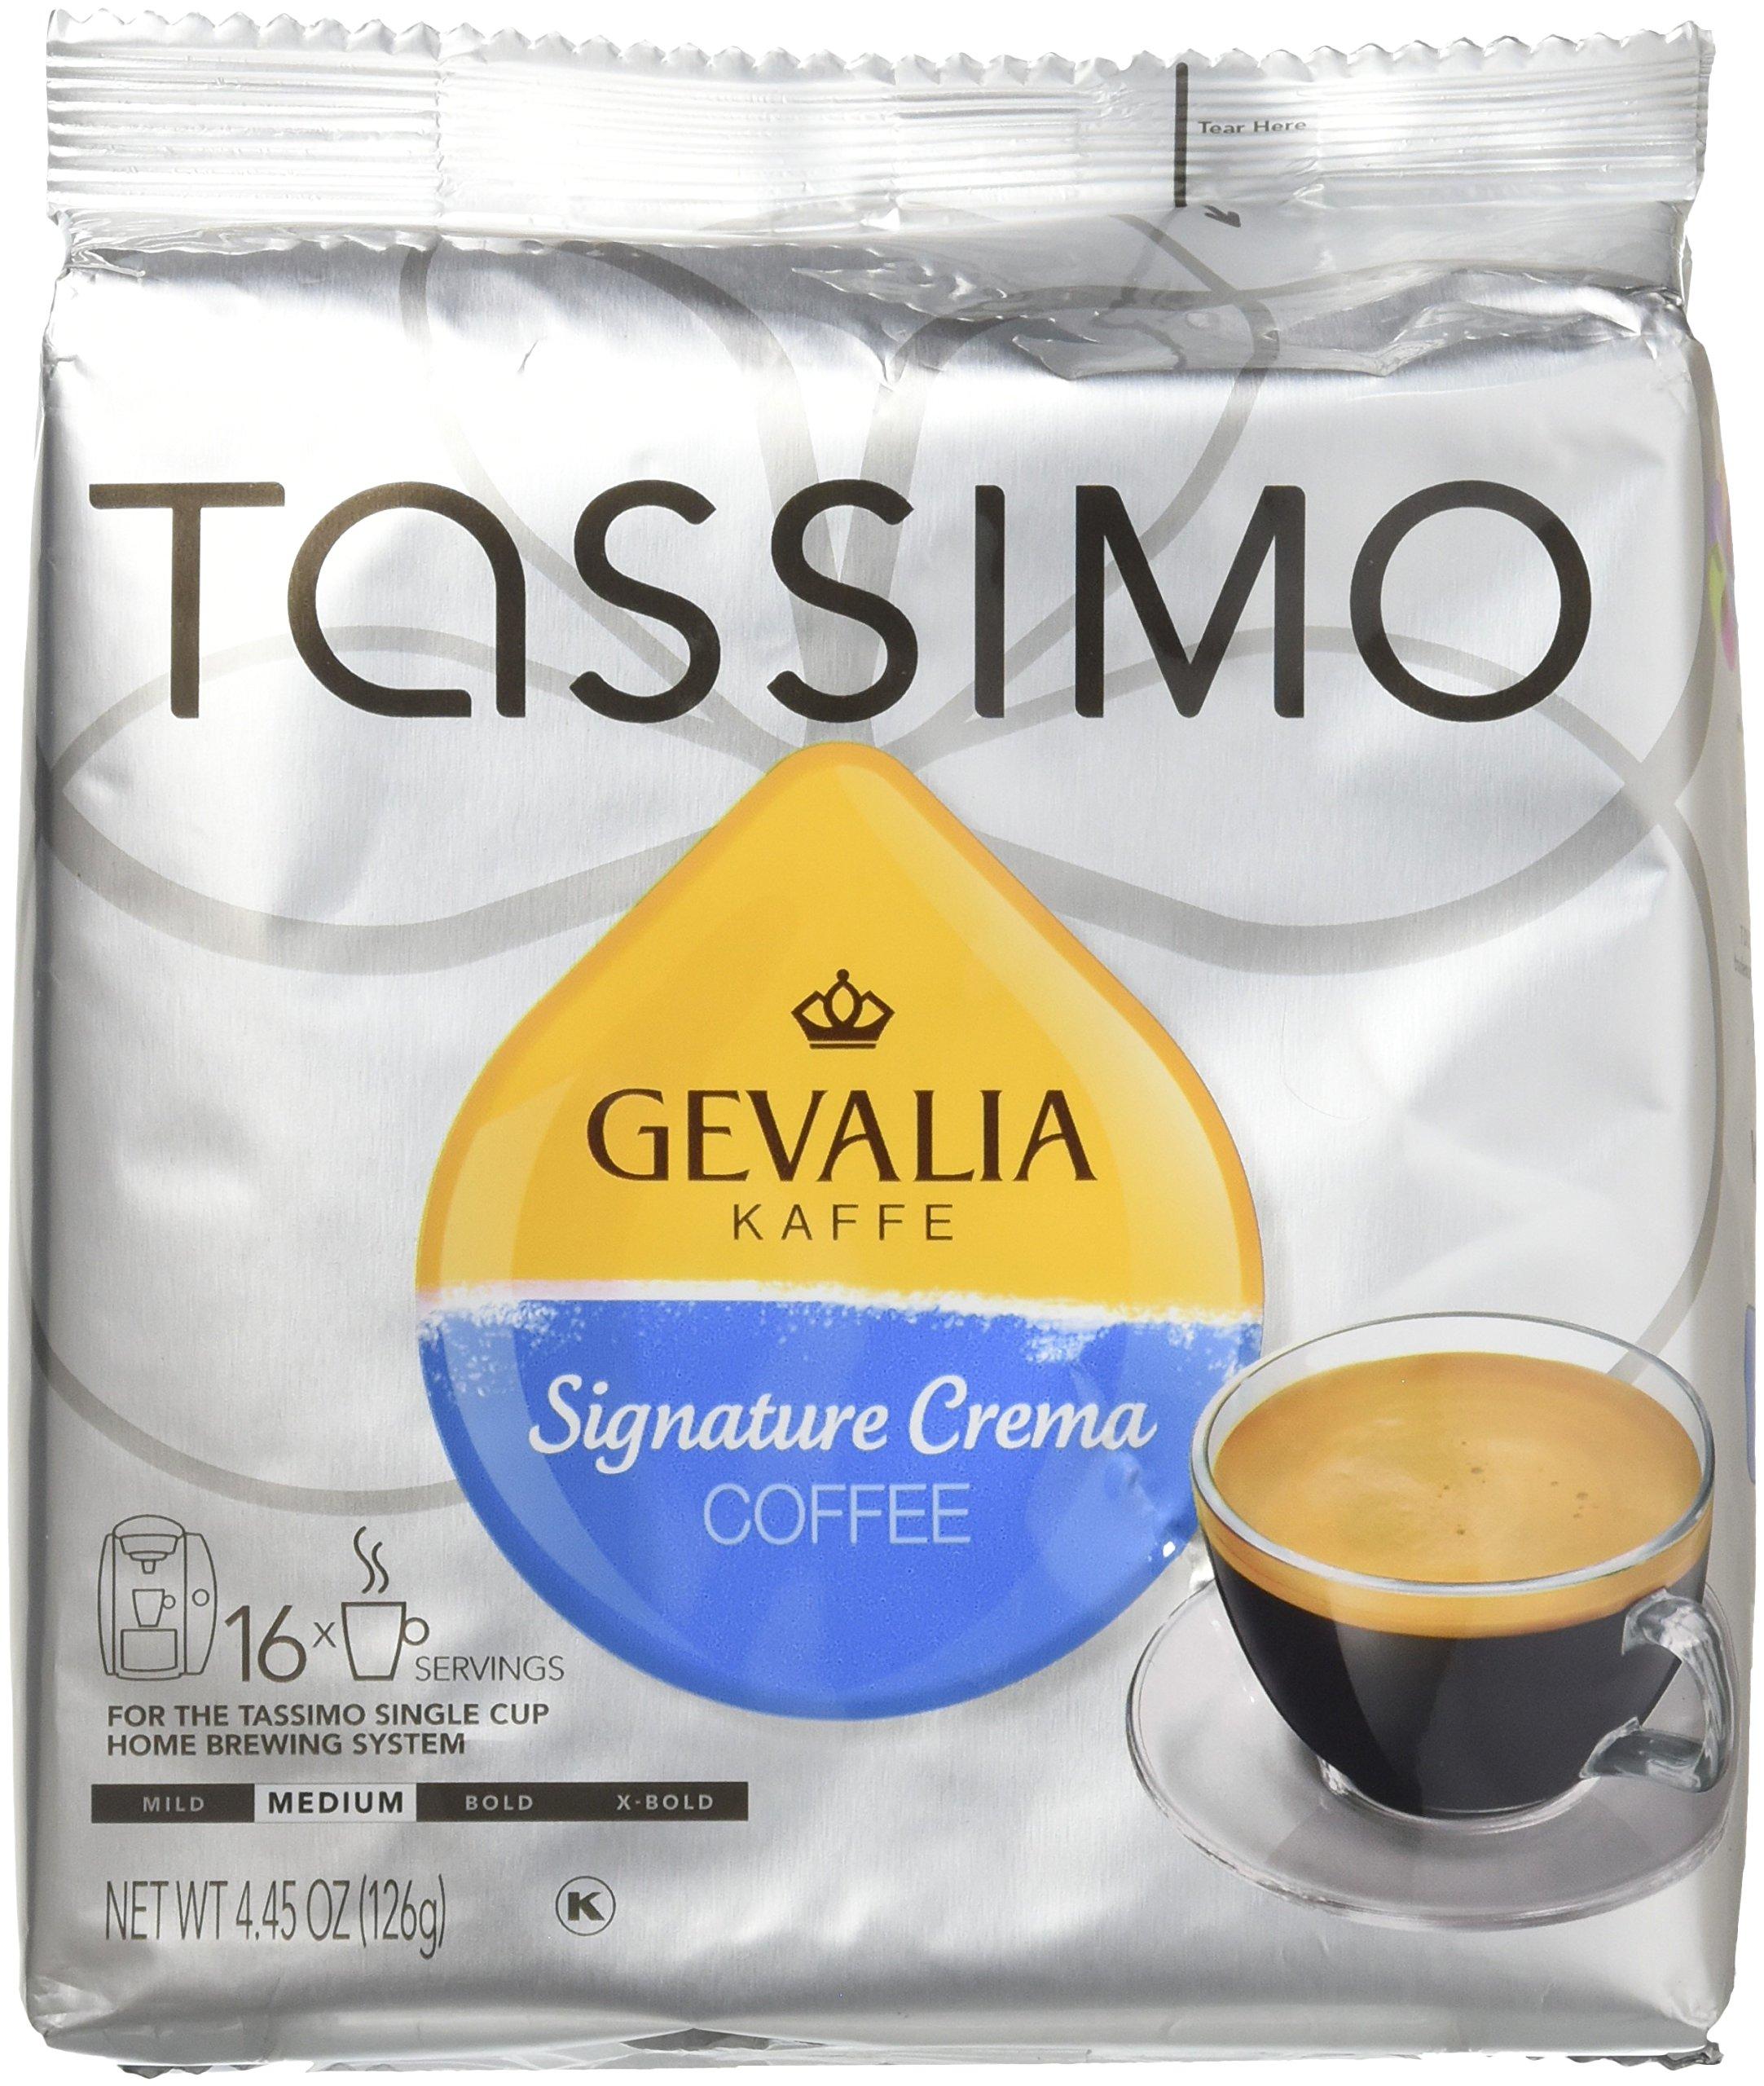 Gevalia Kaffe Signature Crema Coffee T-Discs